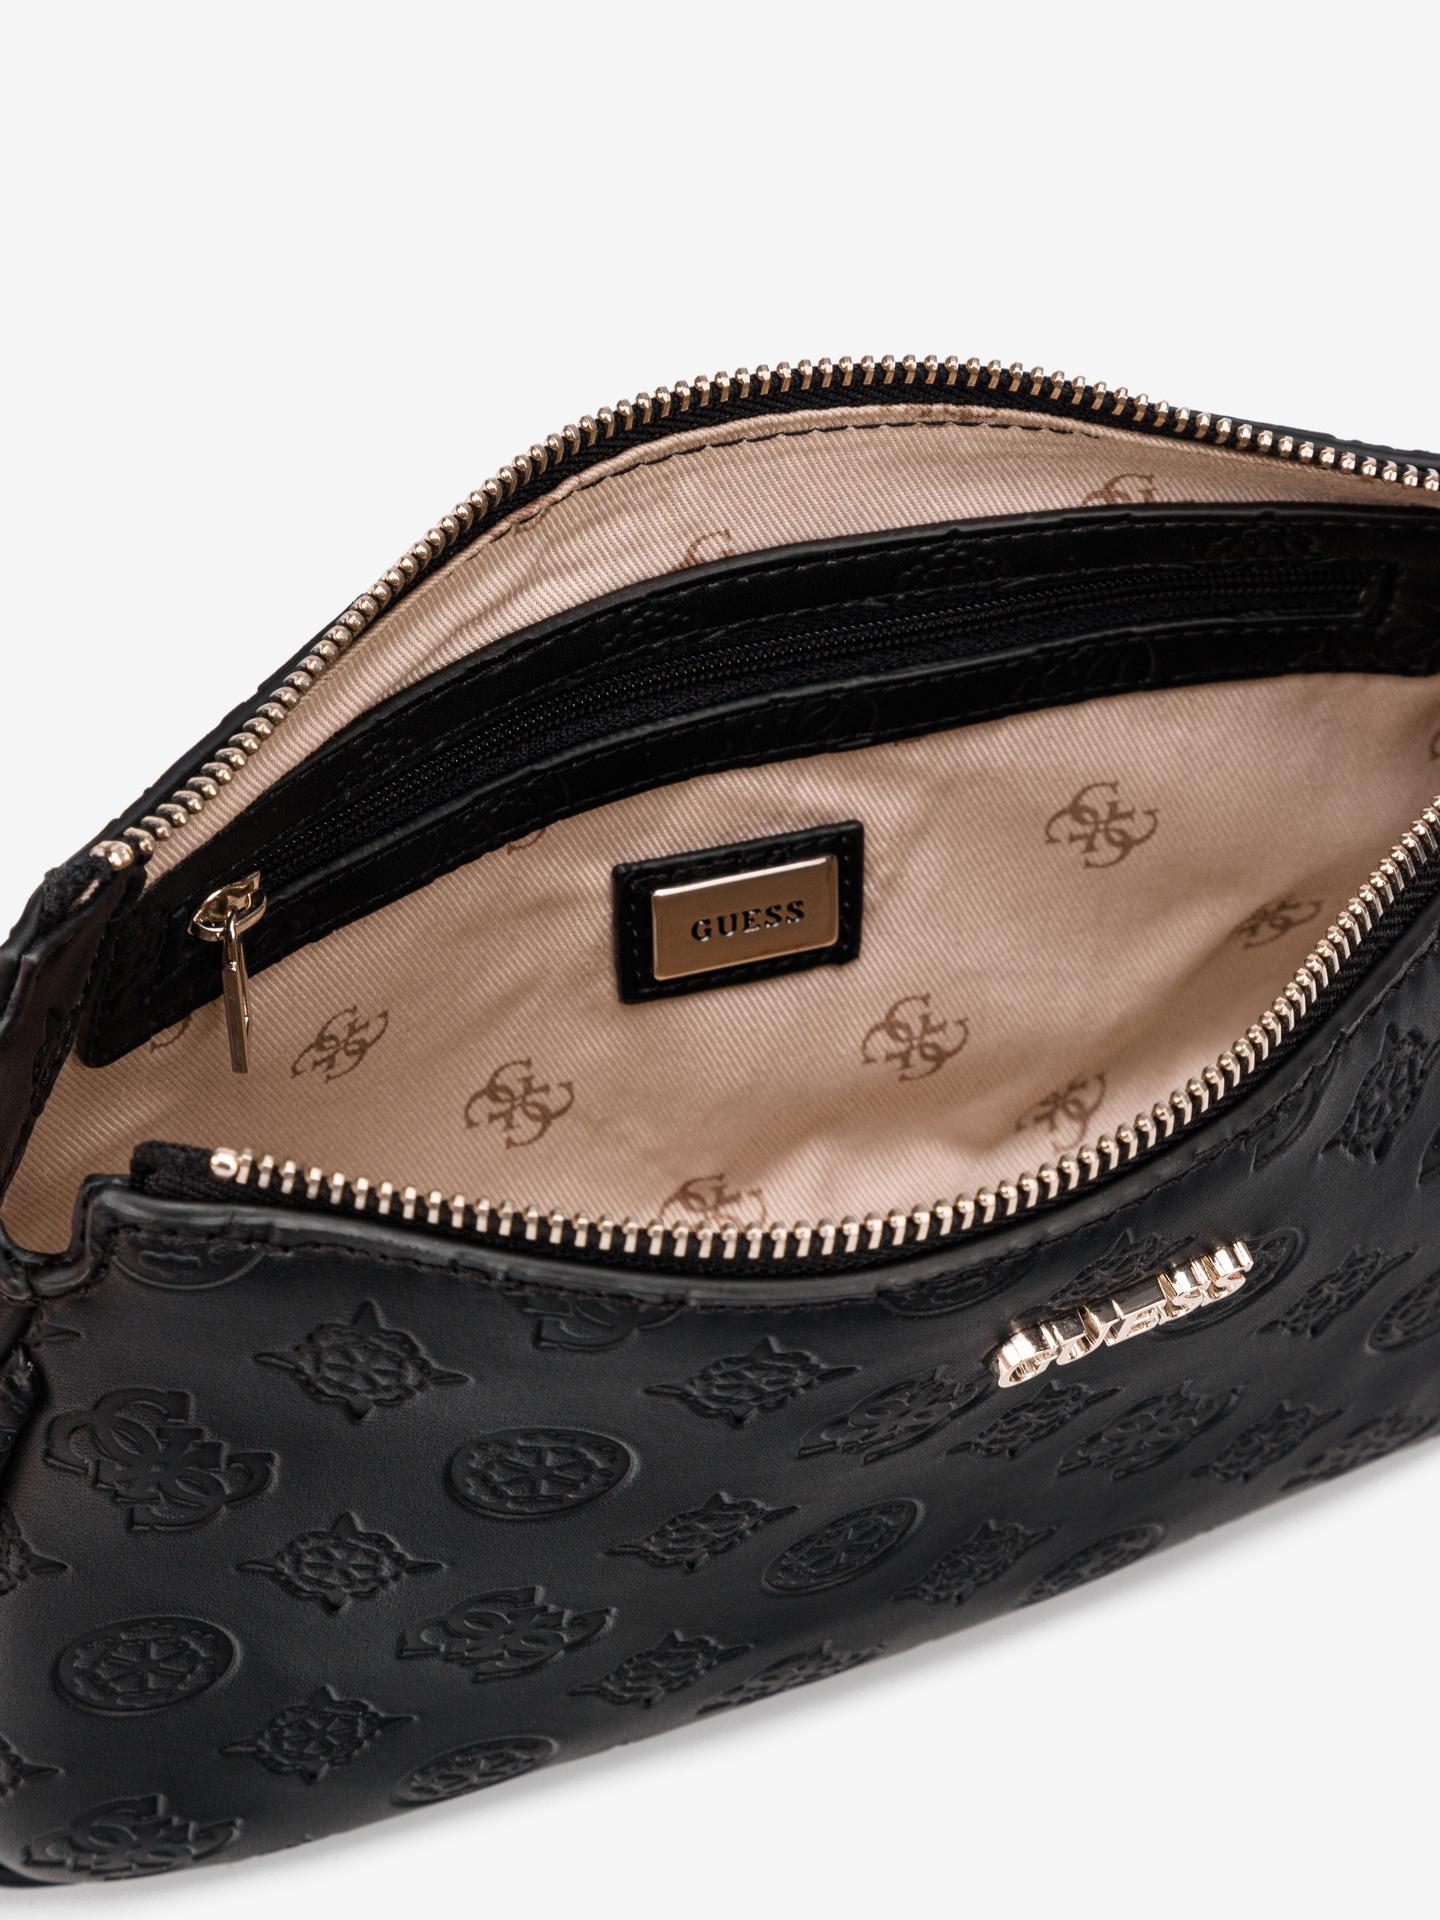 Guess black crossbody handbag Dyanne Double